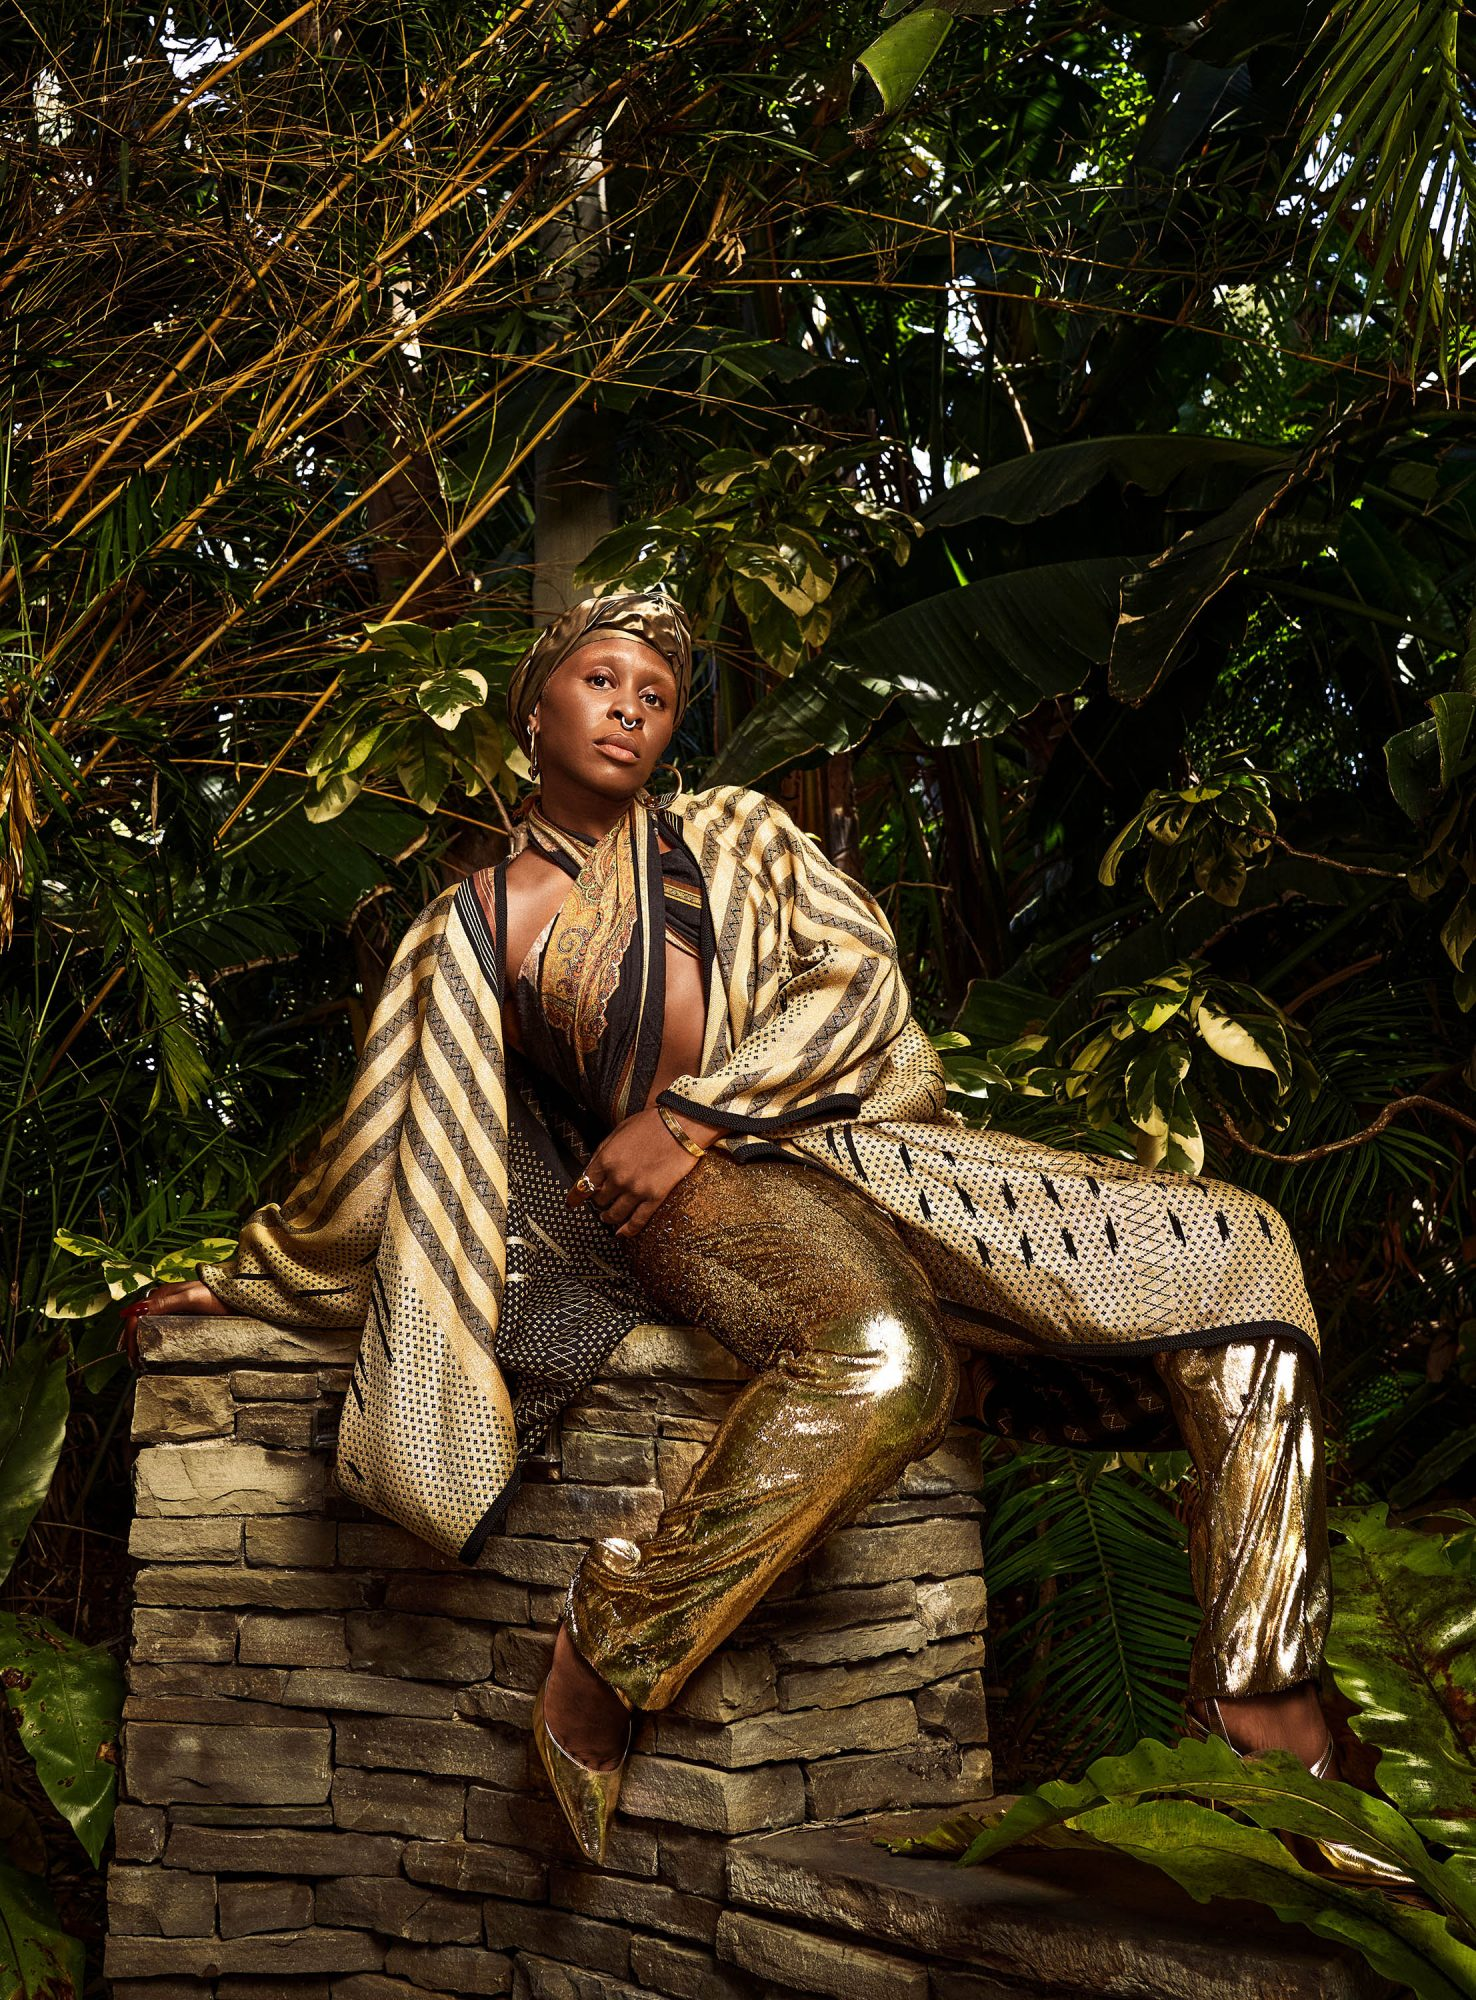 Cynthia-Erivo-Instyle-magazine-beauty